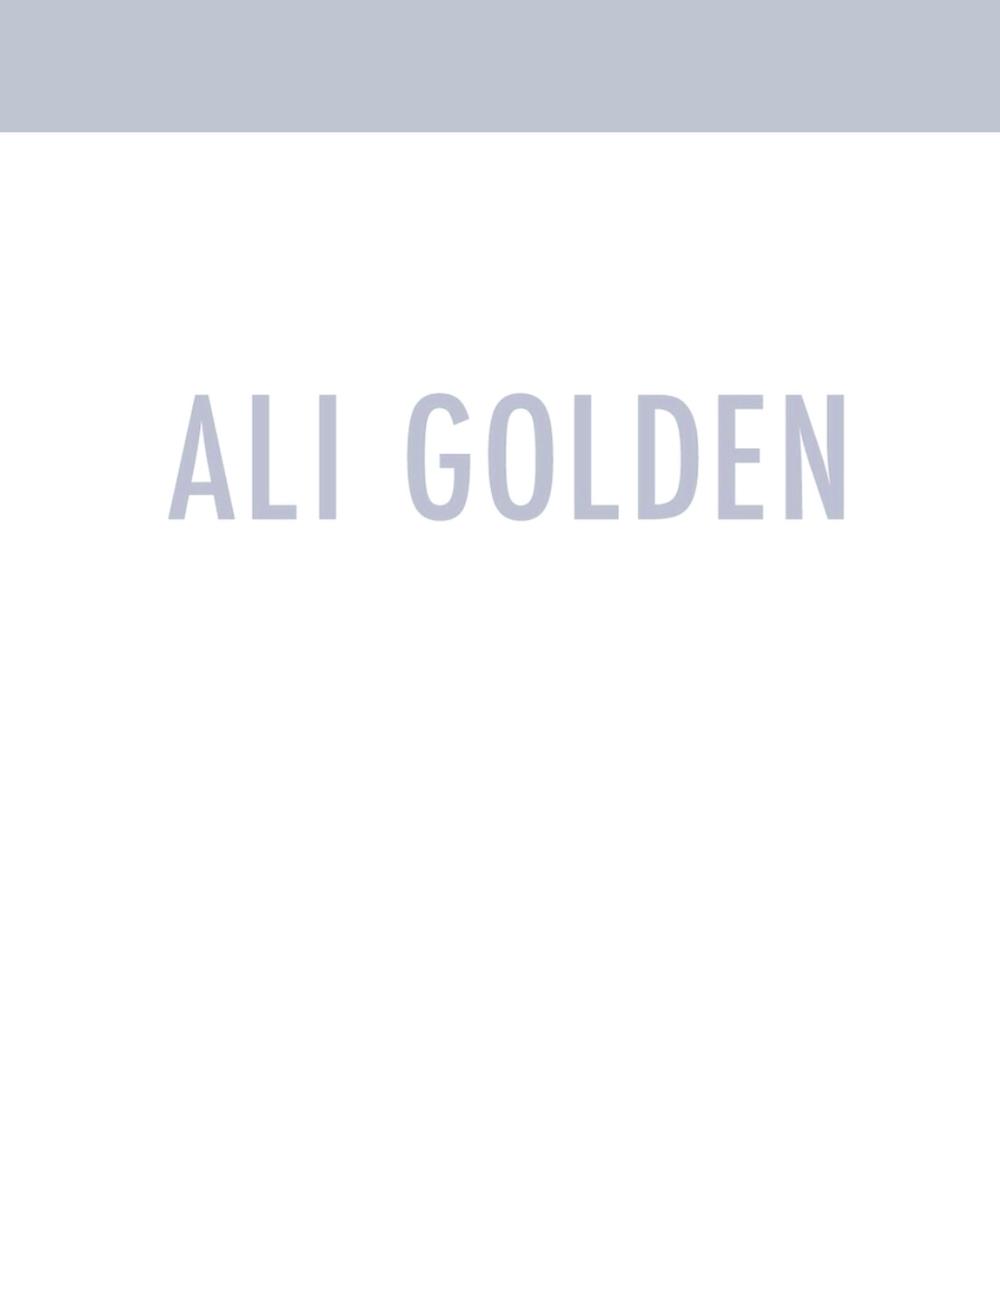 Ali Golden Web Design-Sindoora Satyavada.jpg